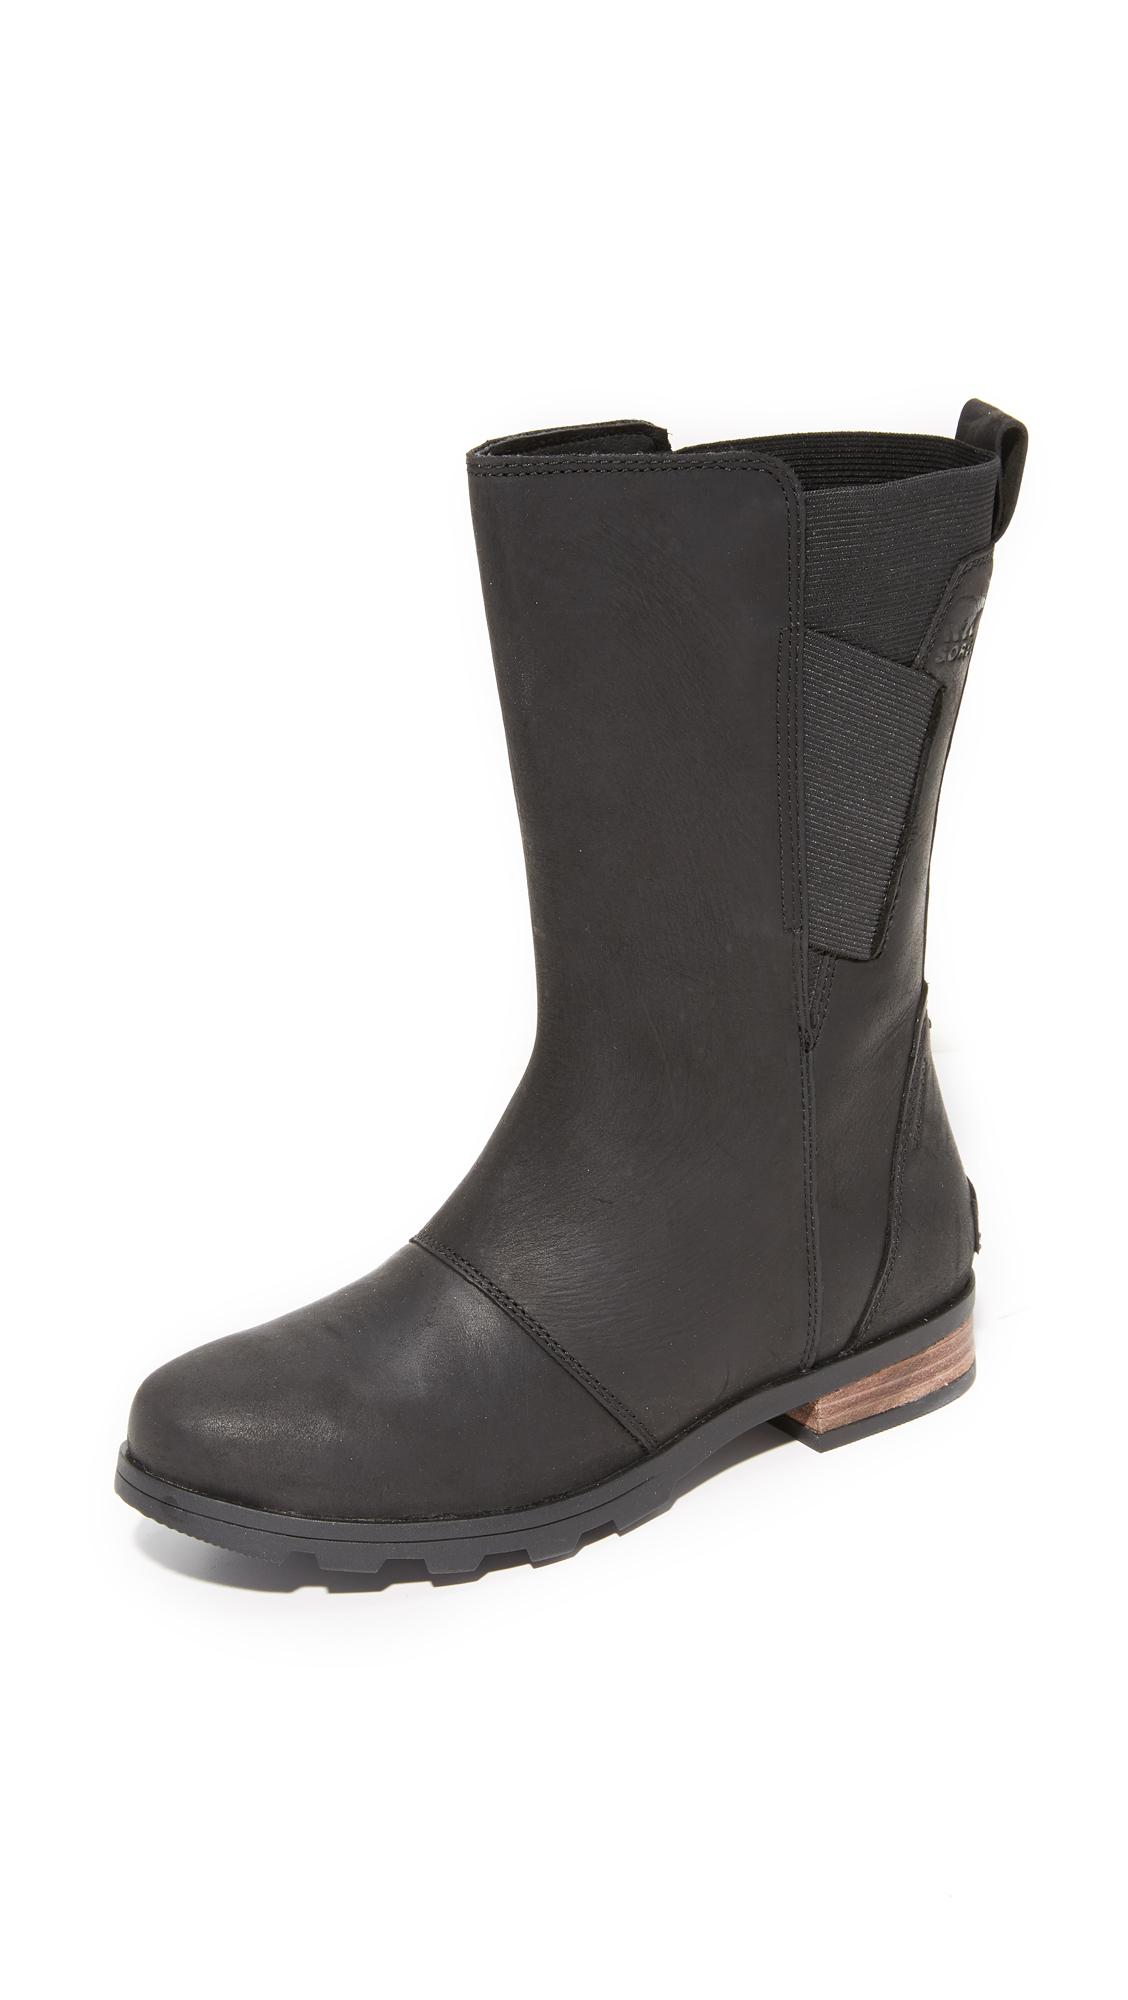 Sorel Suede Emelie Mid Boots In Black Lyst